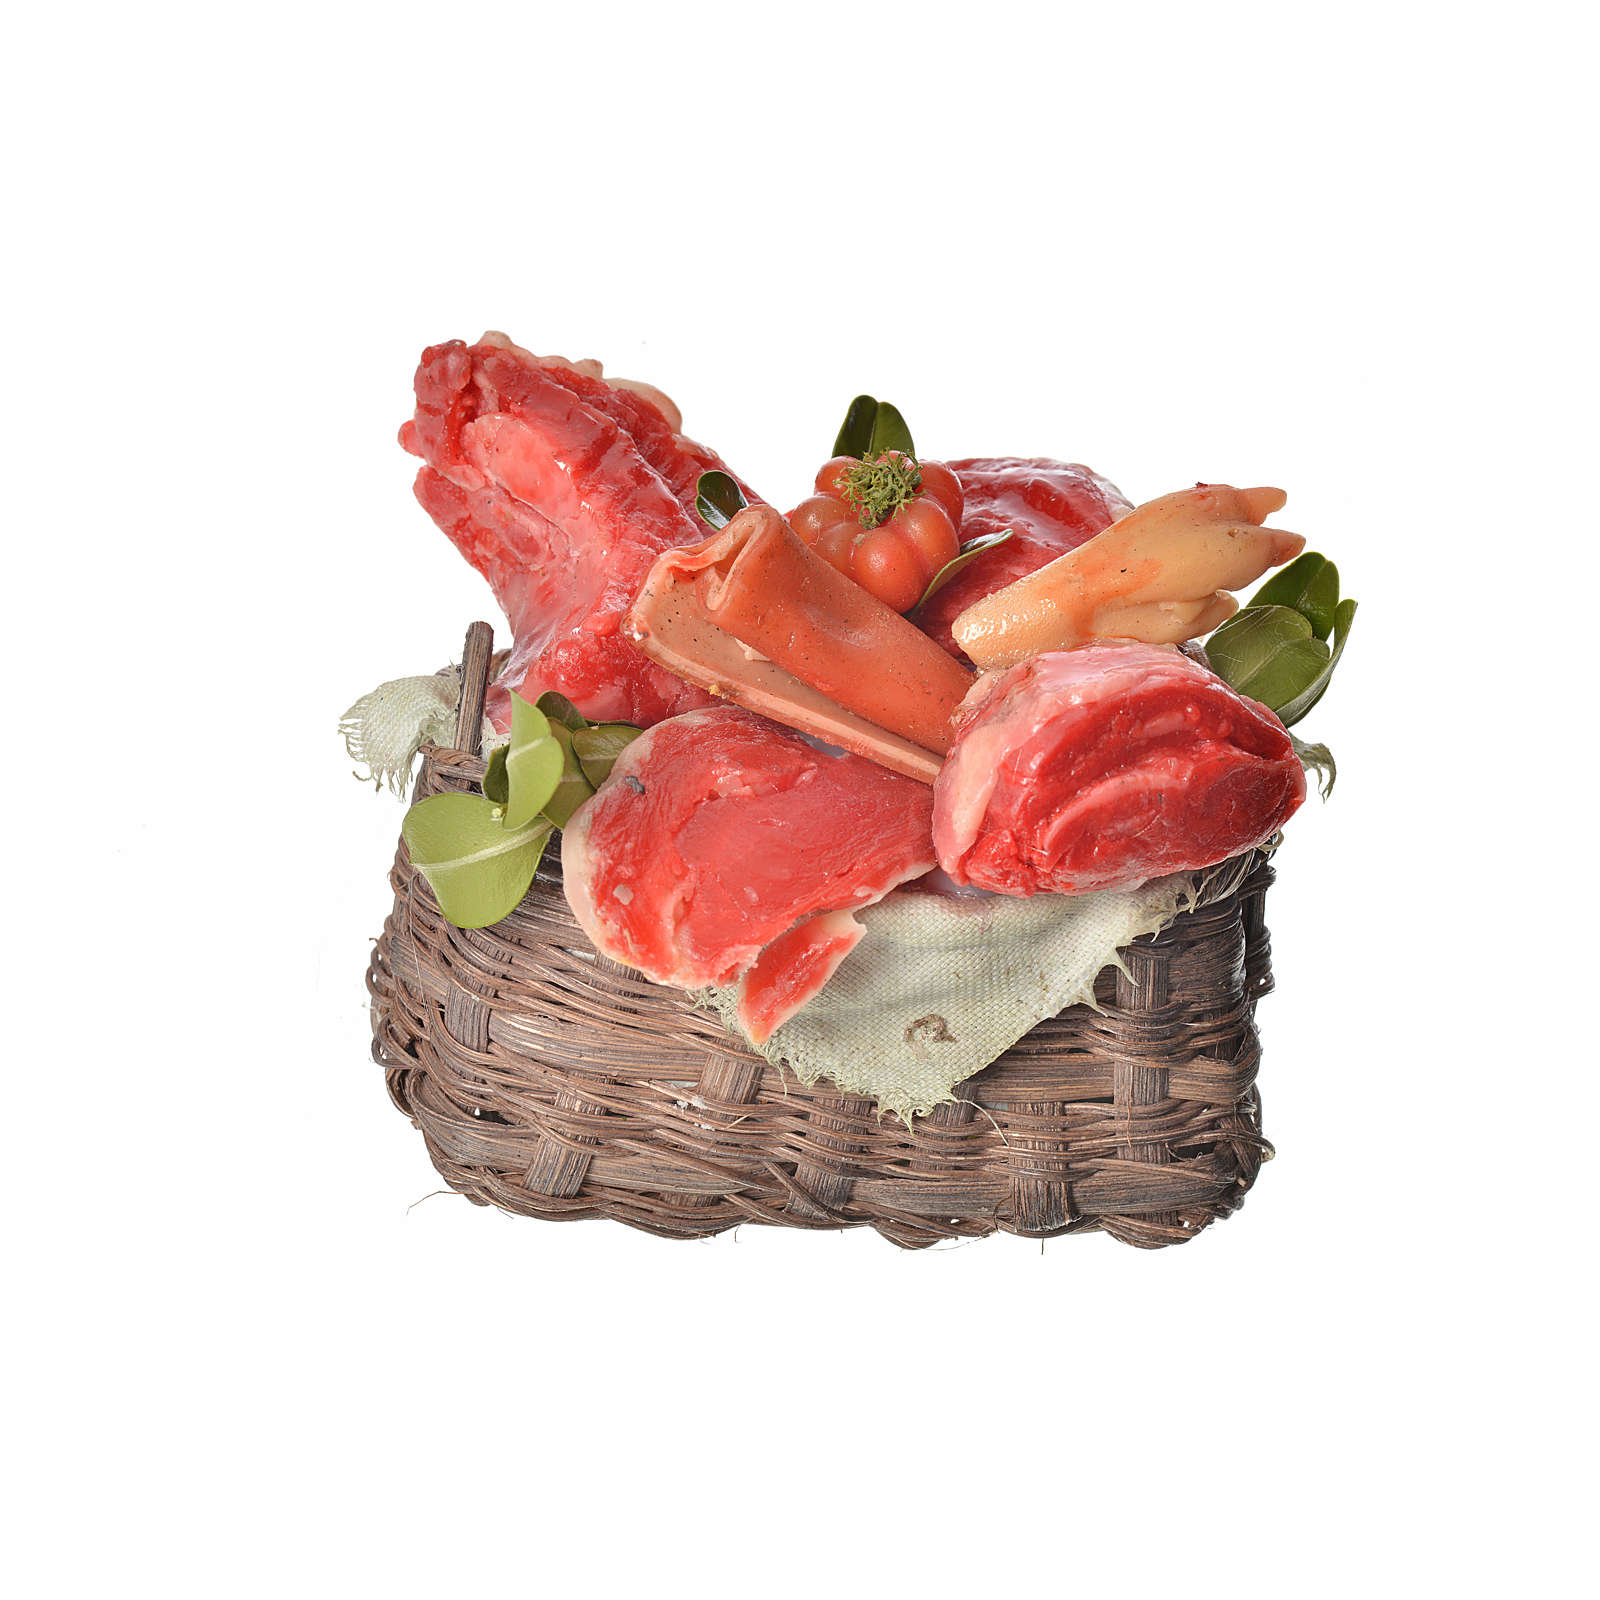 Nativity accessory, meat basket in wax, 10x7x8cm 4